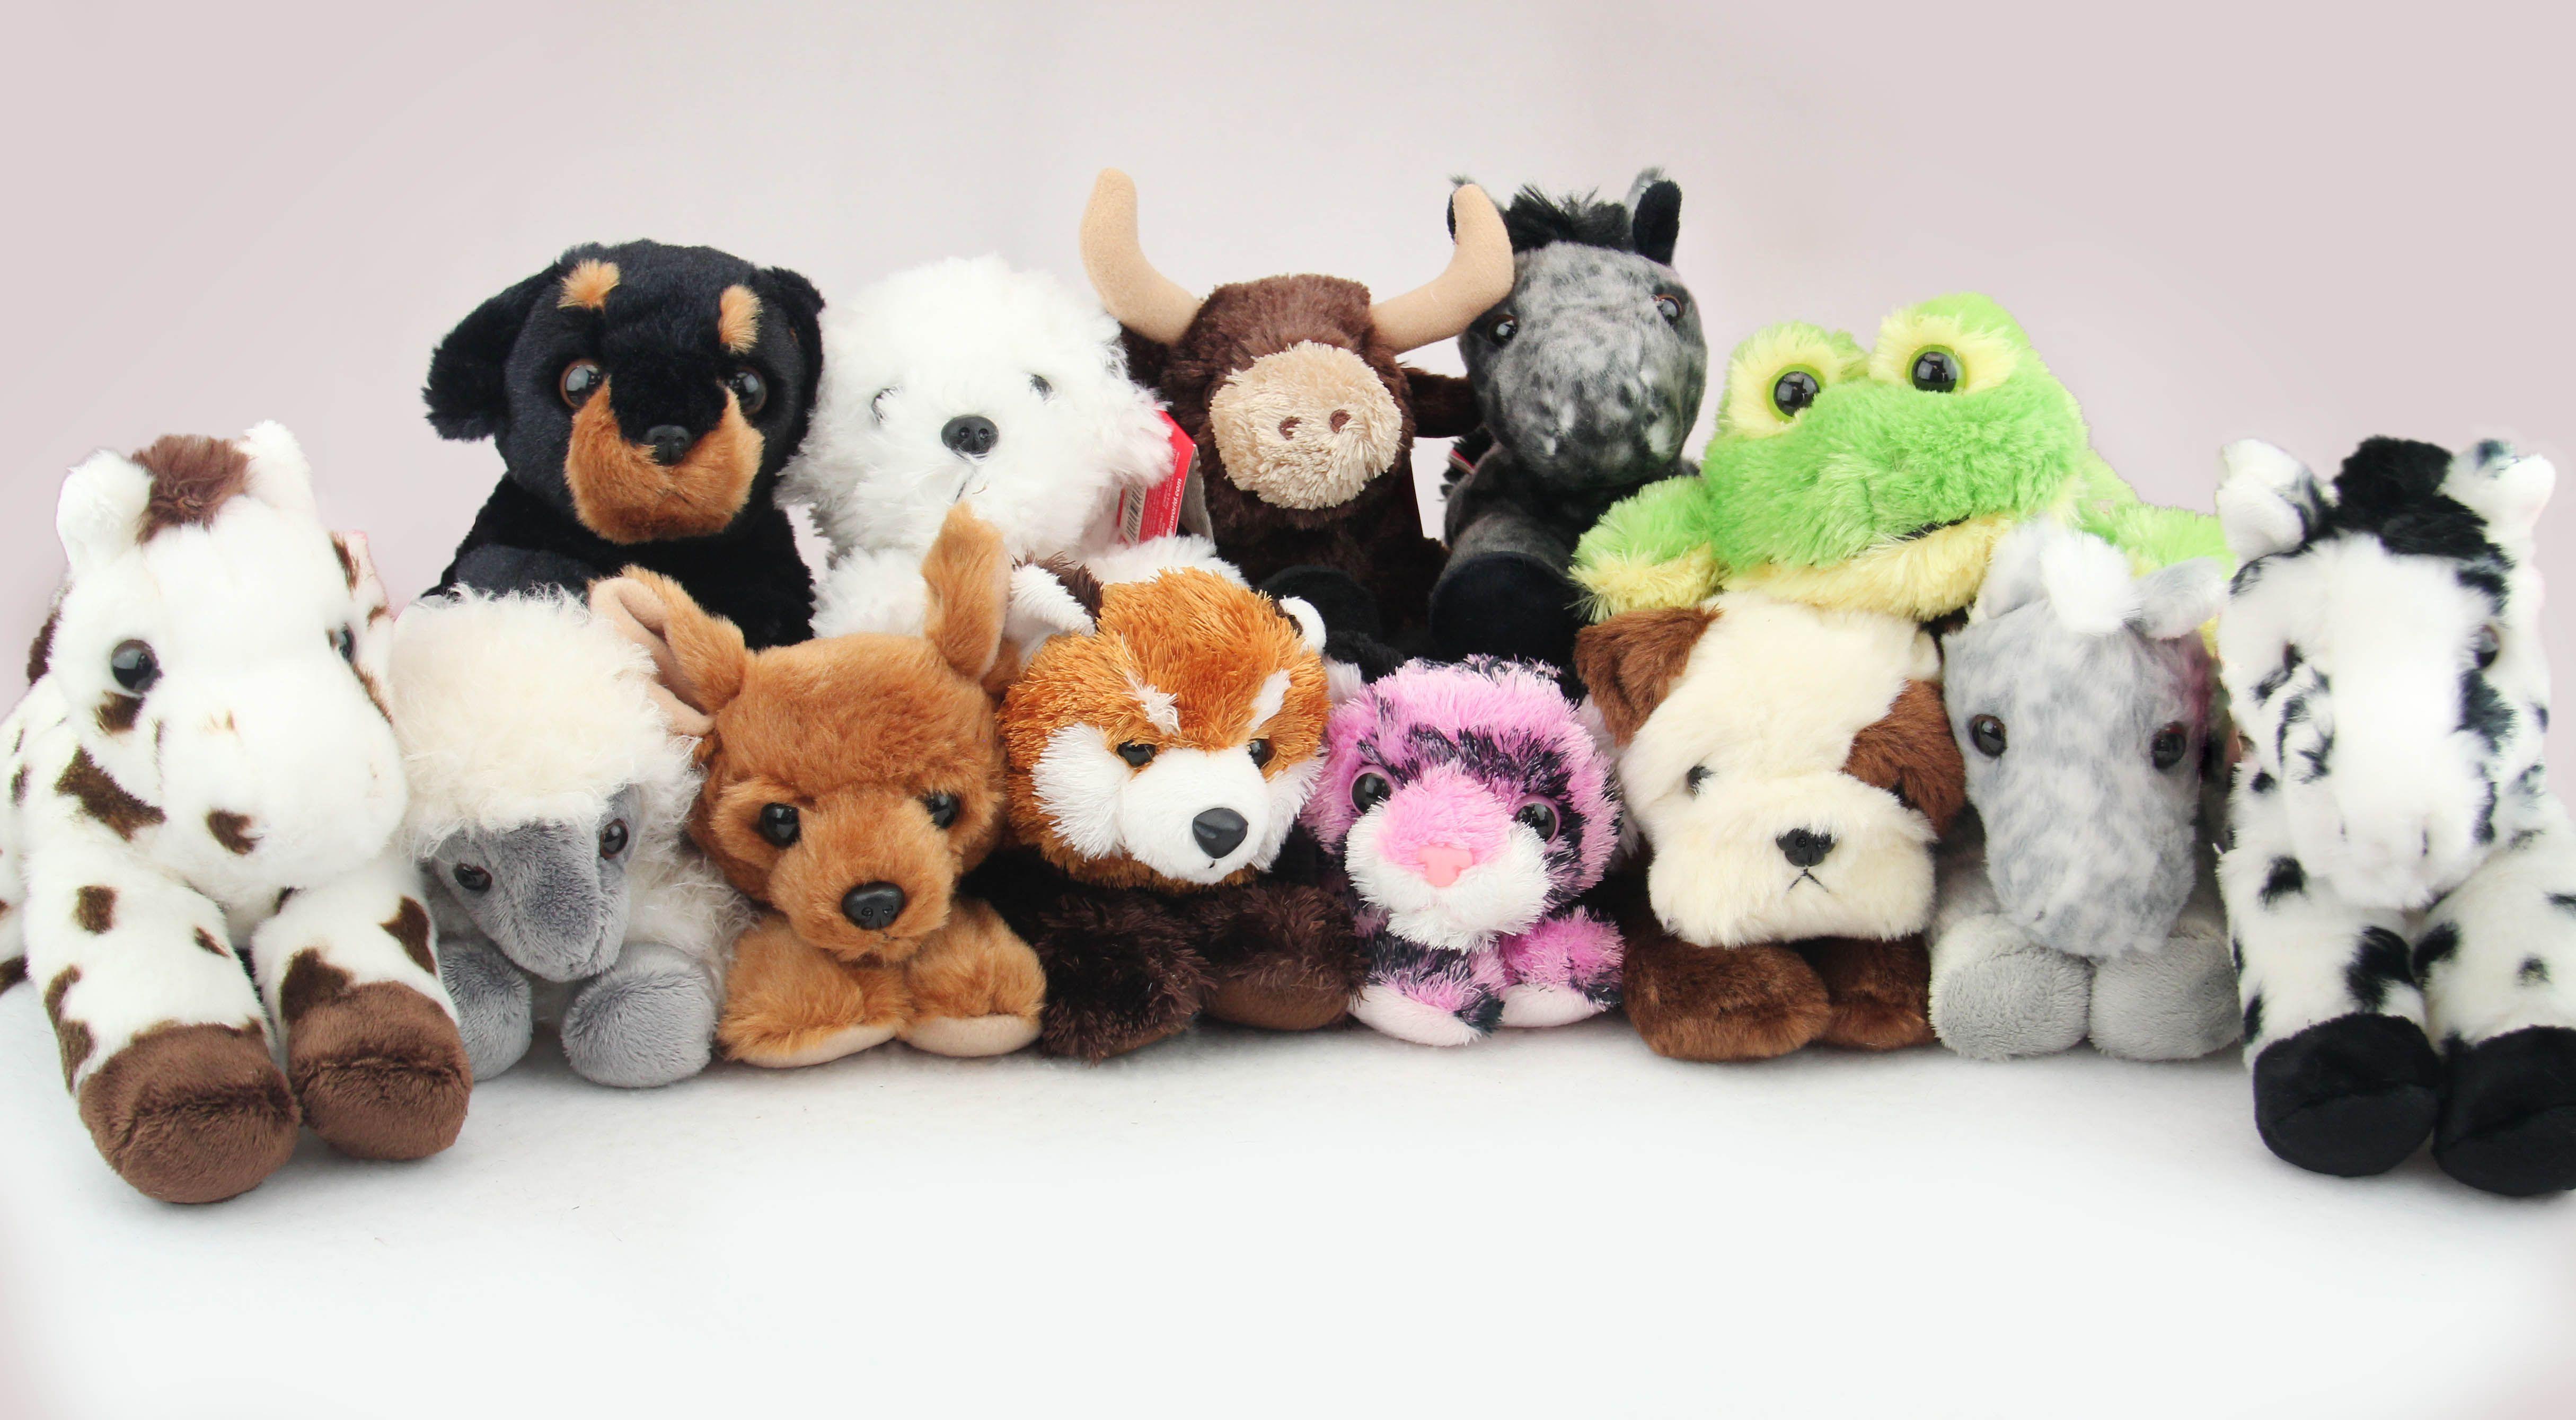 Stuffed Animal Collection 5 Ways to Display Stuffed